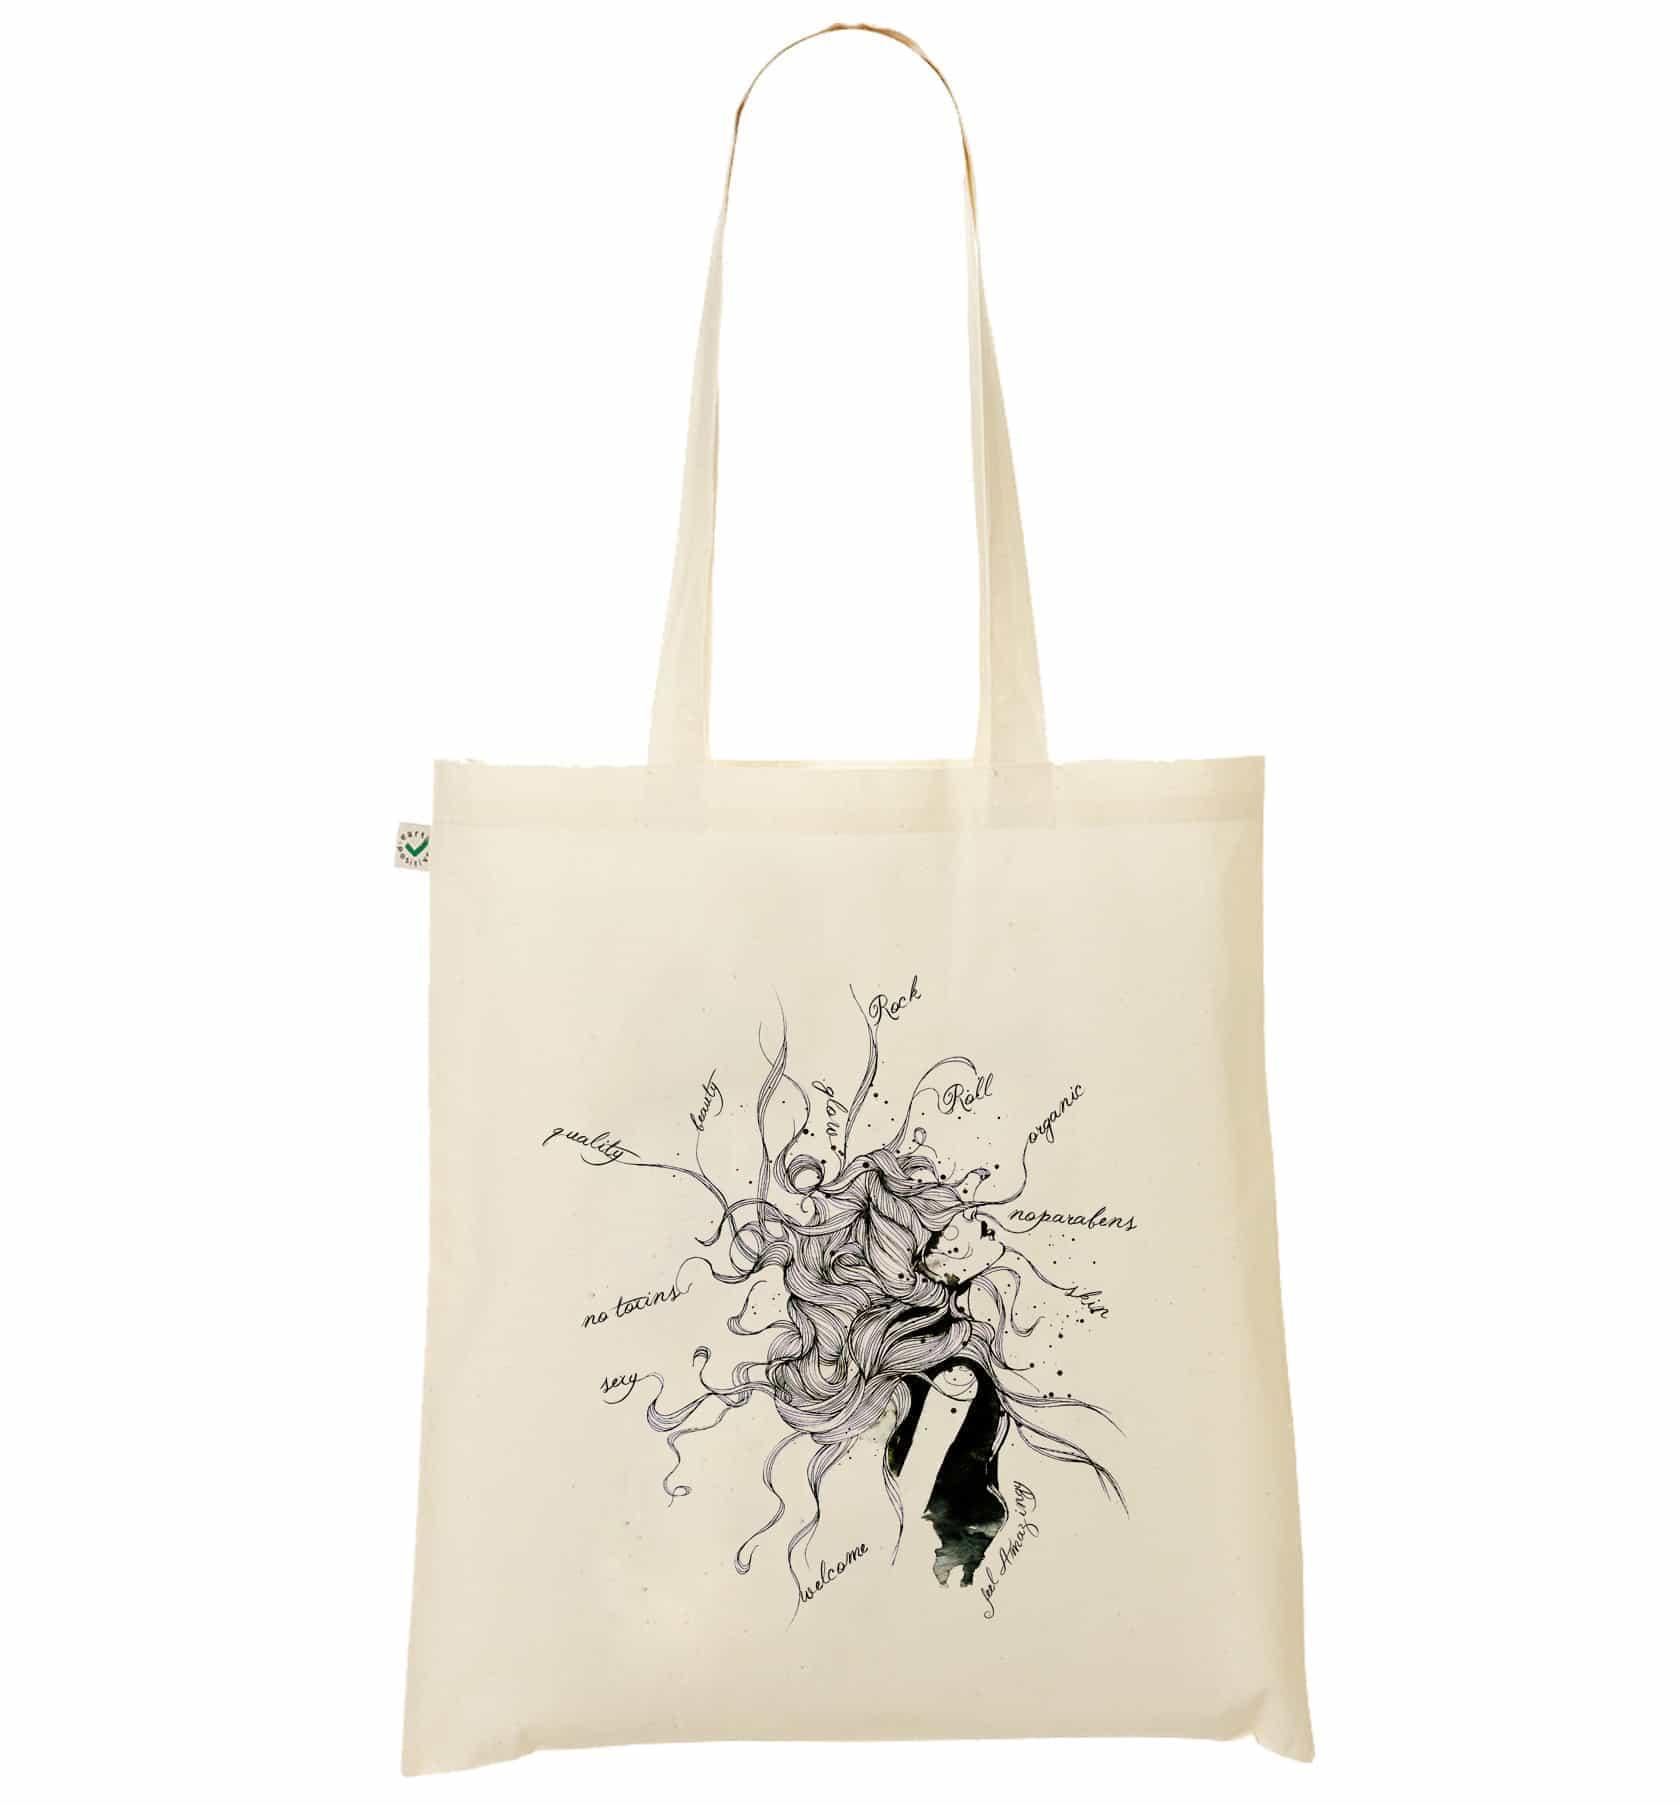 767b1520e19f2 Amazingy - Organic cotton tote bag   Messy Hair